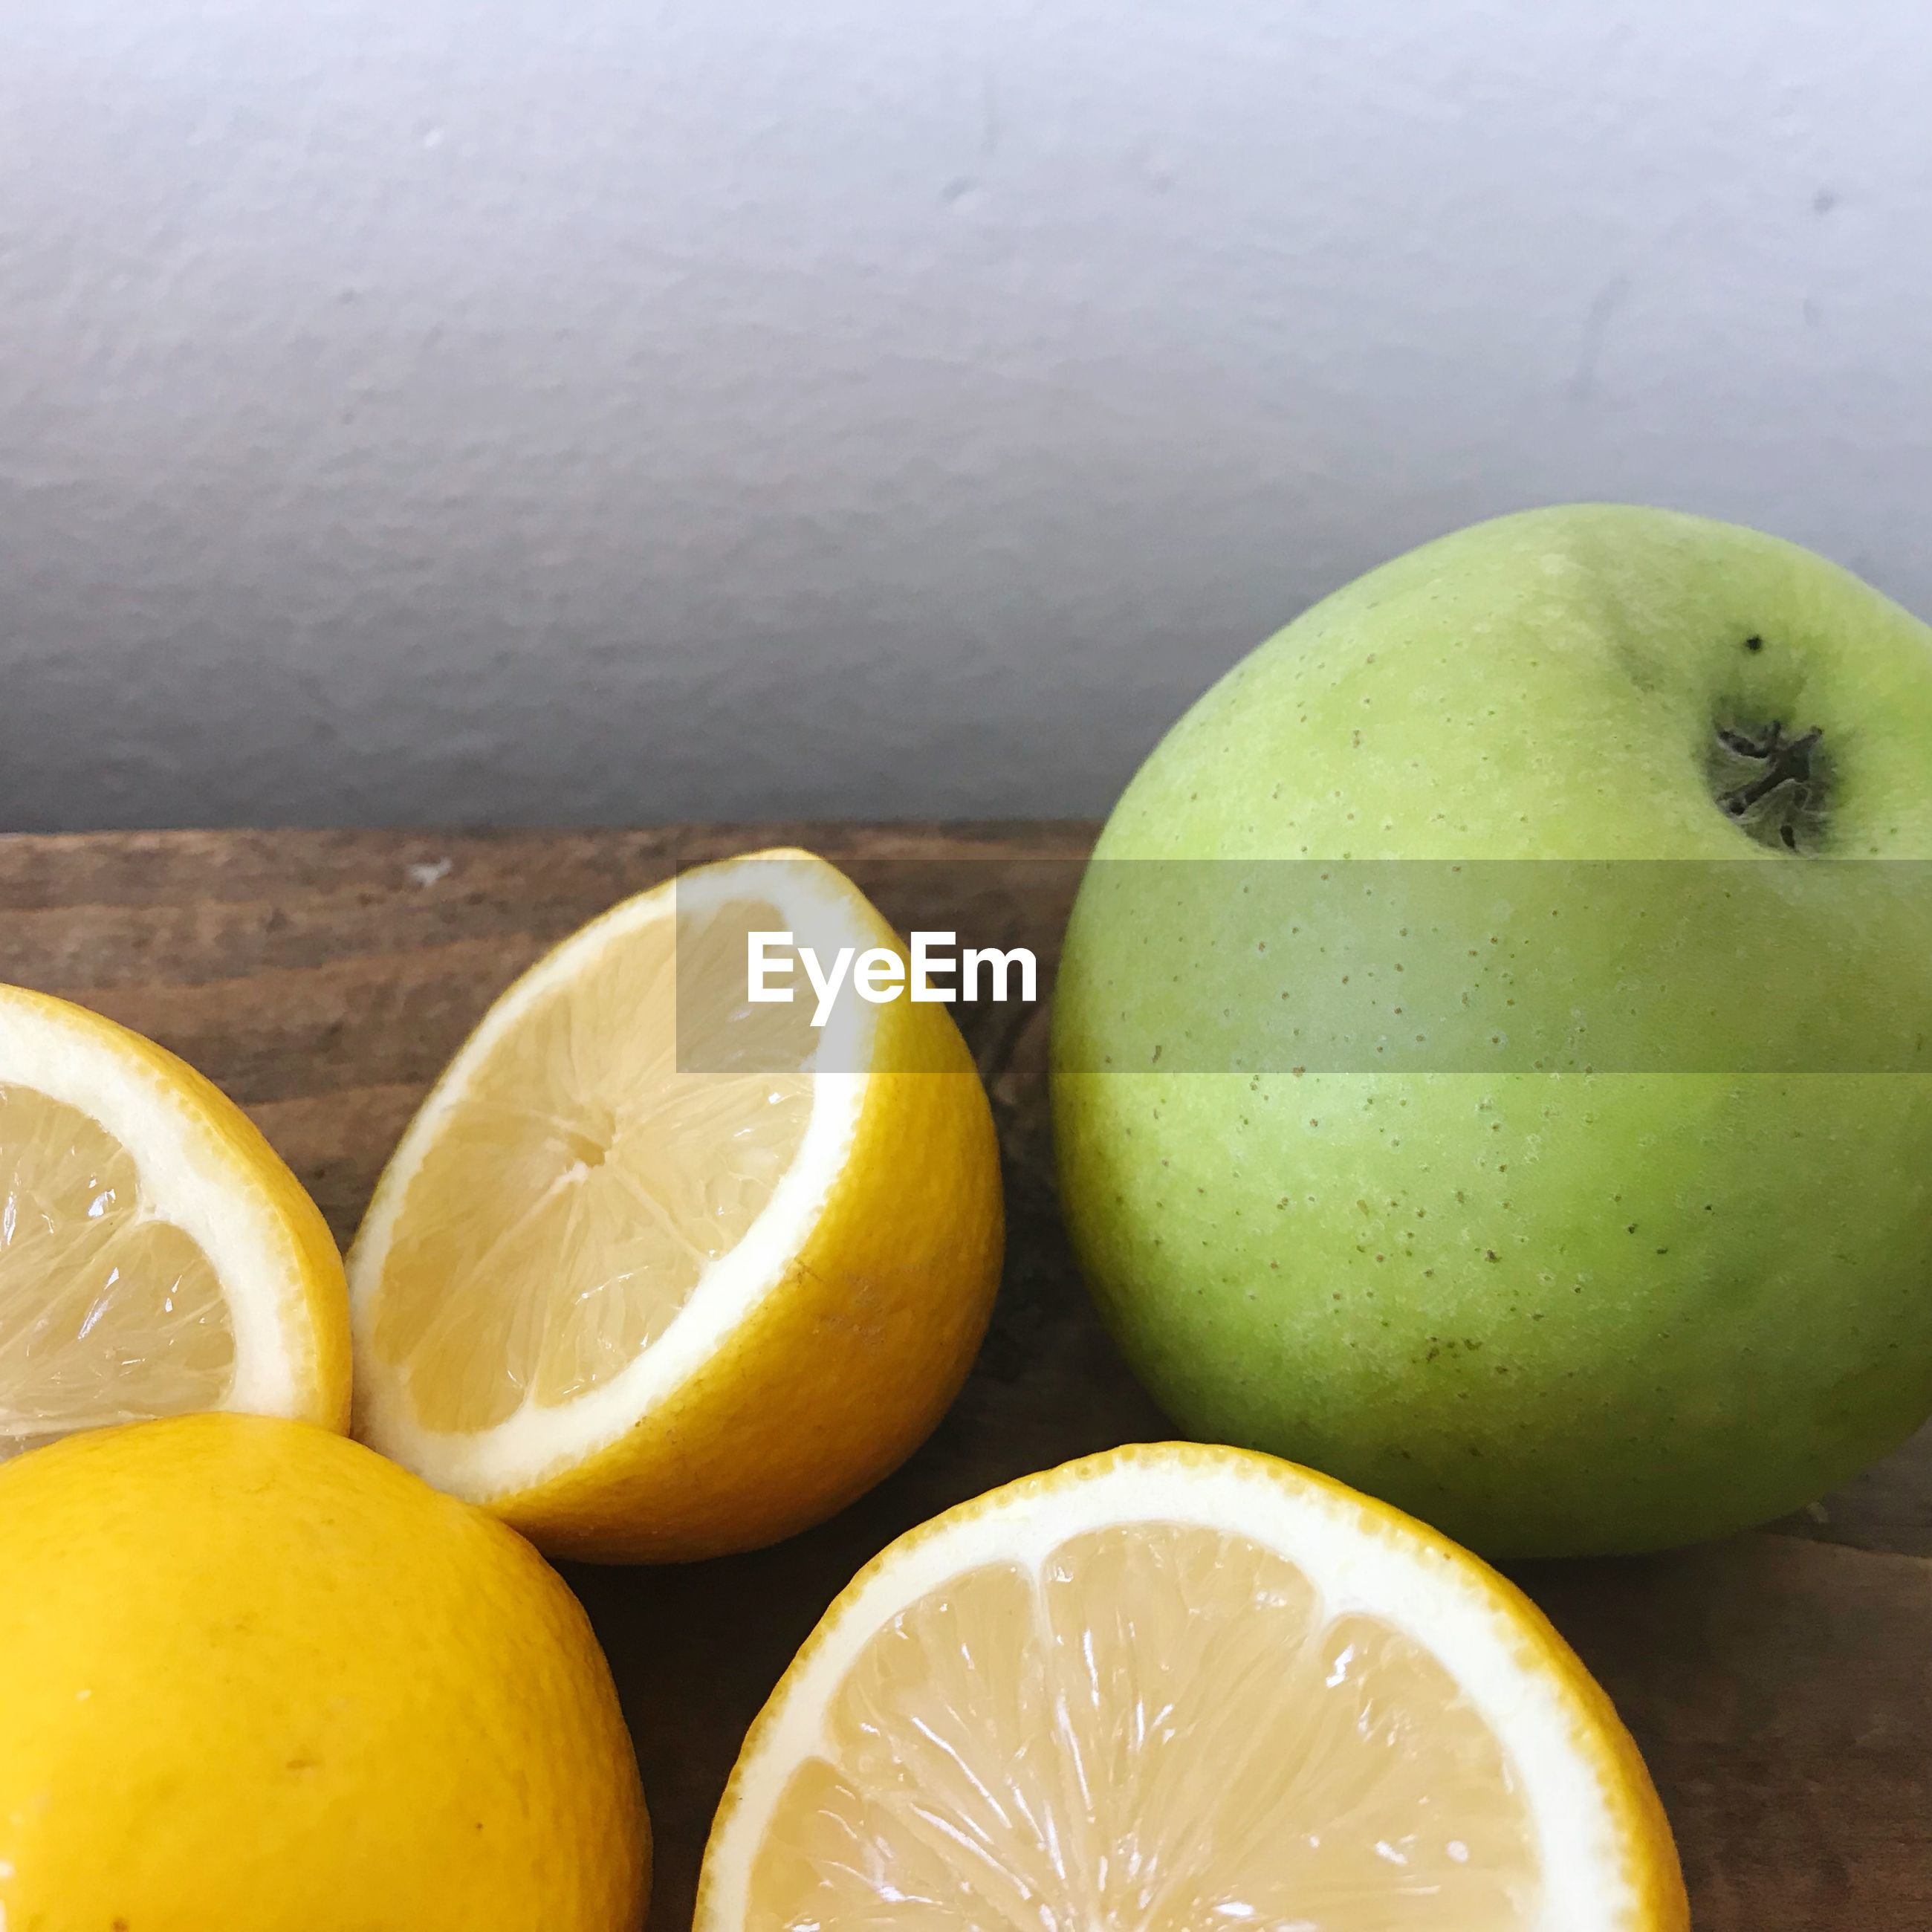 HIGH ANGLE VIEW OF APPLE ON TABLE